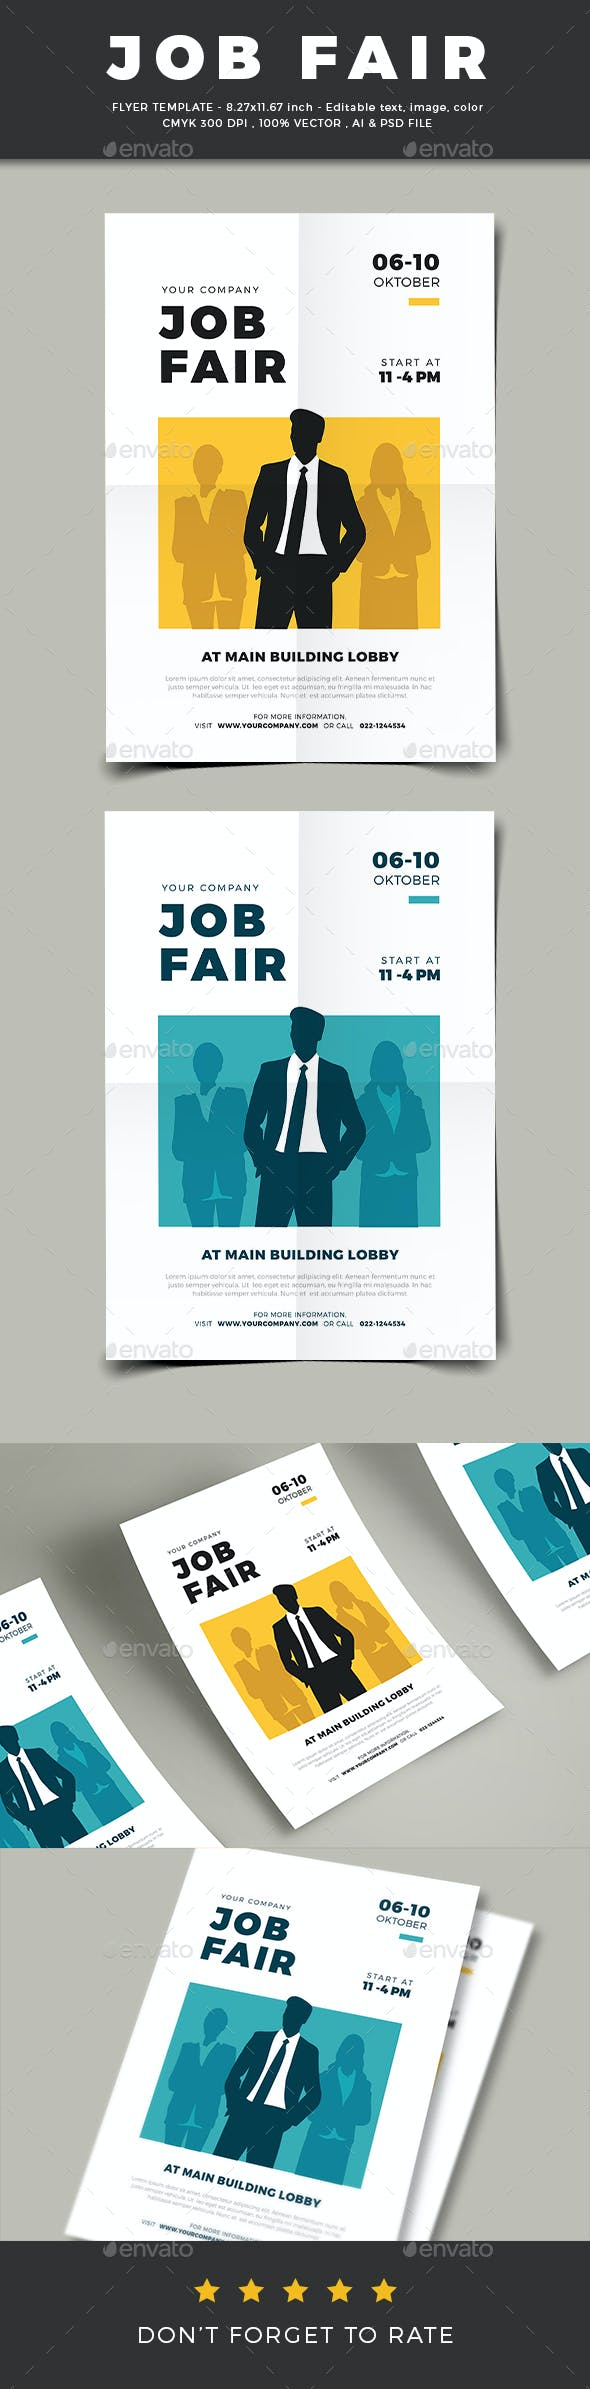 job fair flyer template corporate flyers